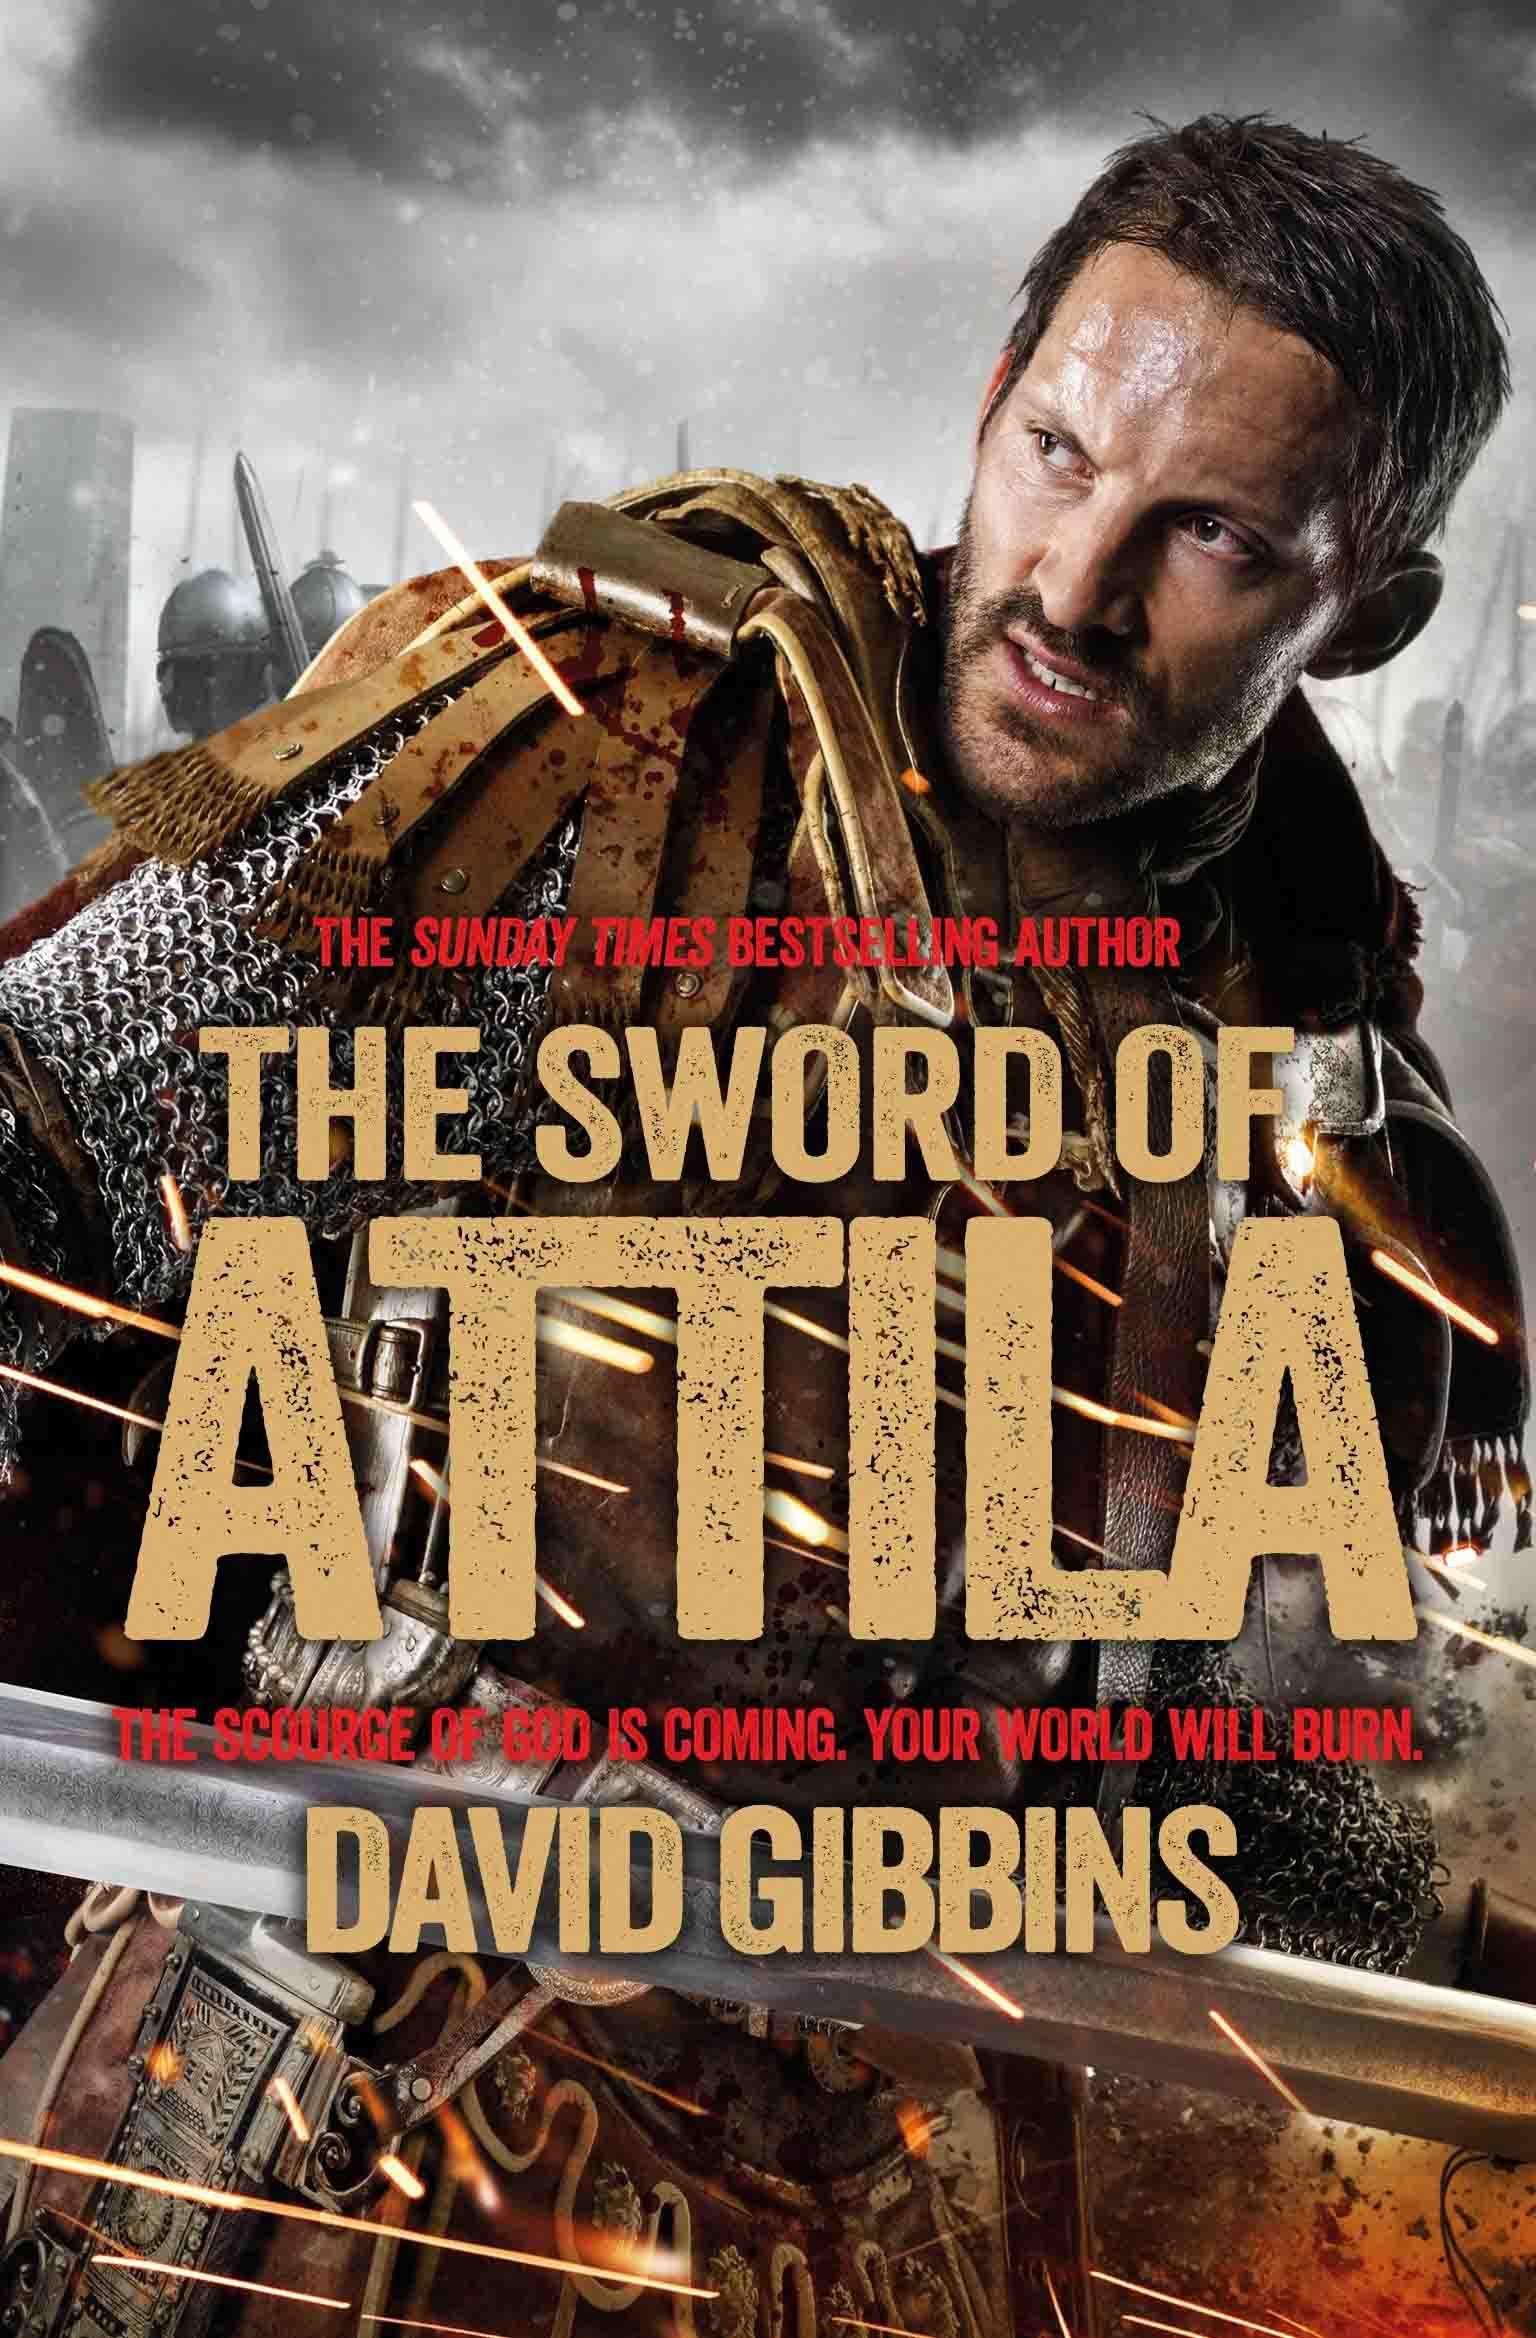 Attila cover UK new medium.jpg